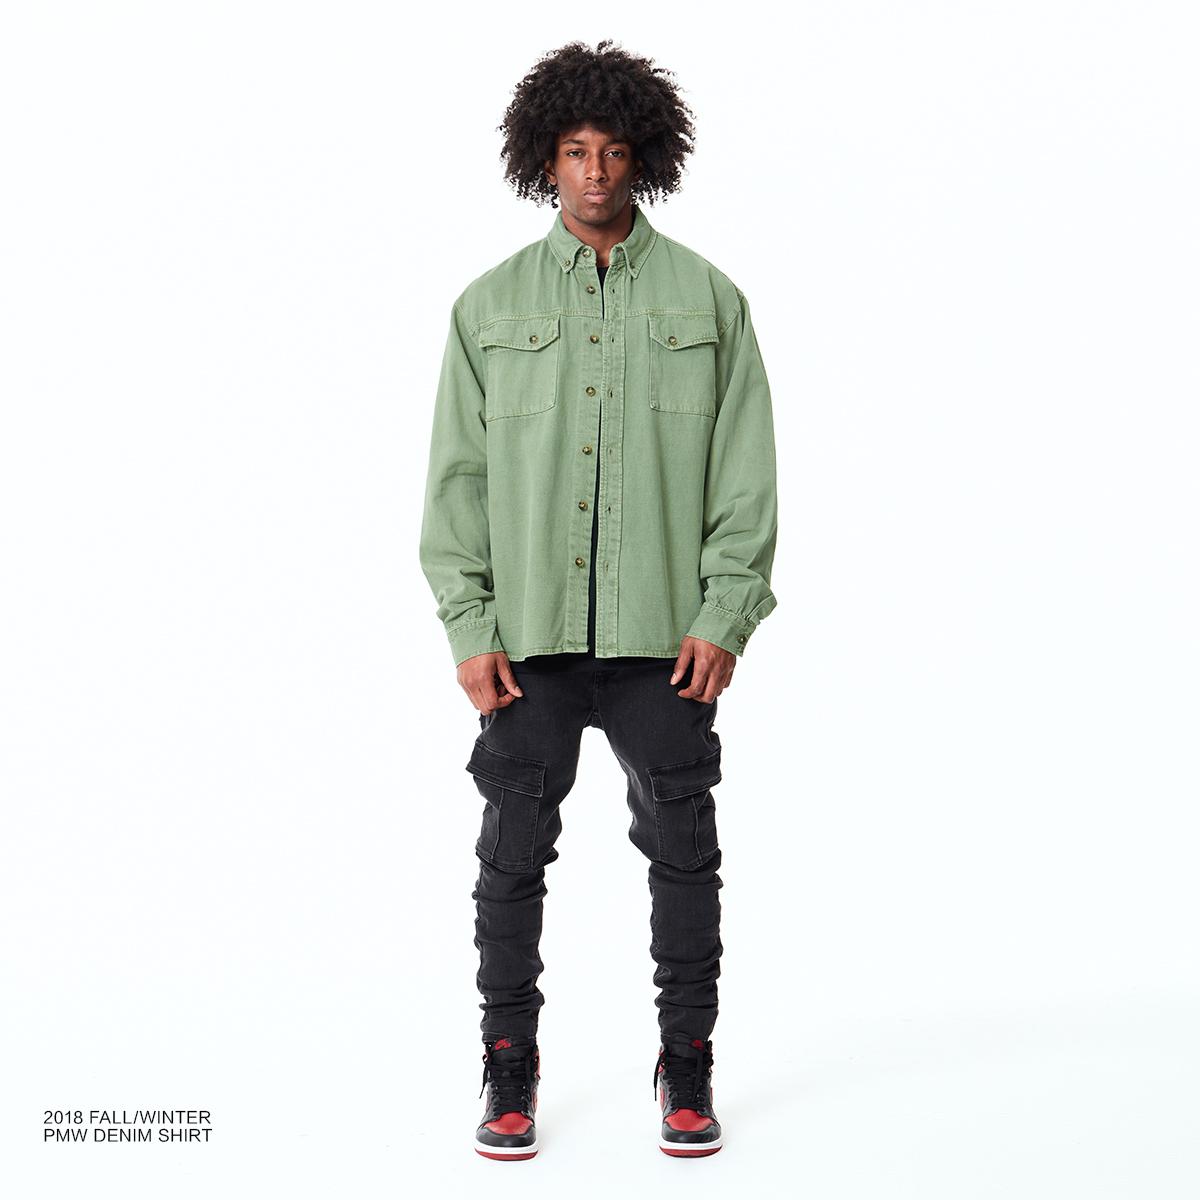 PMW 2018FW OVERSIZE SHIRT 复古水洗做旧宽松灰绿色牛仔衬衫